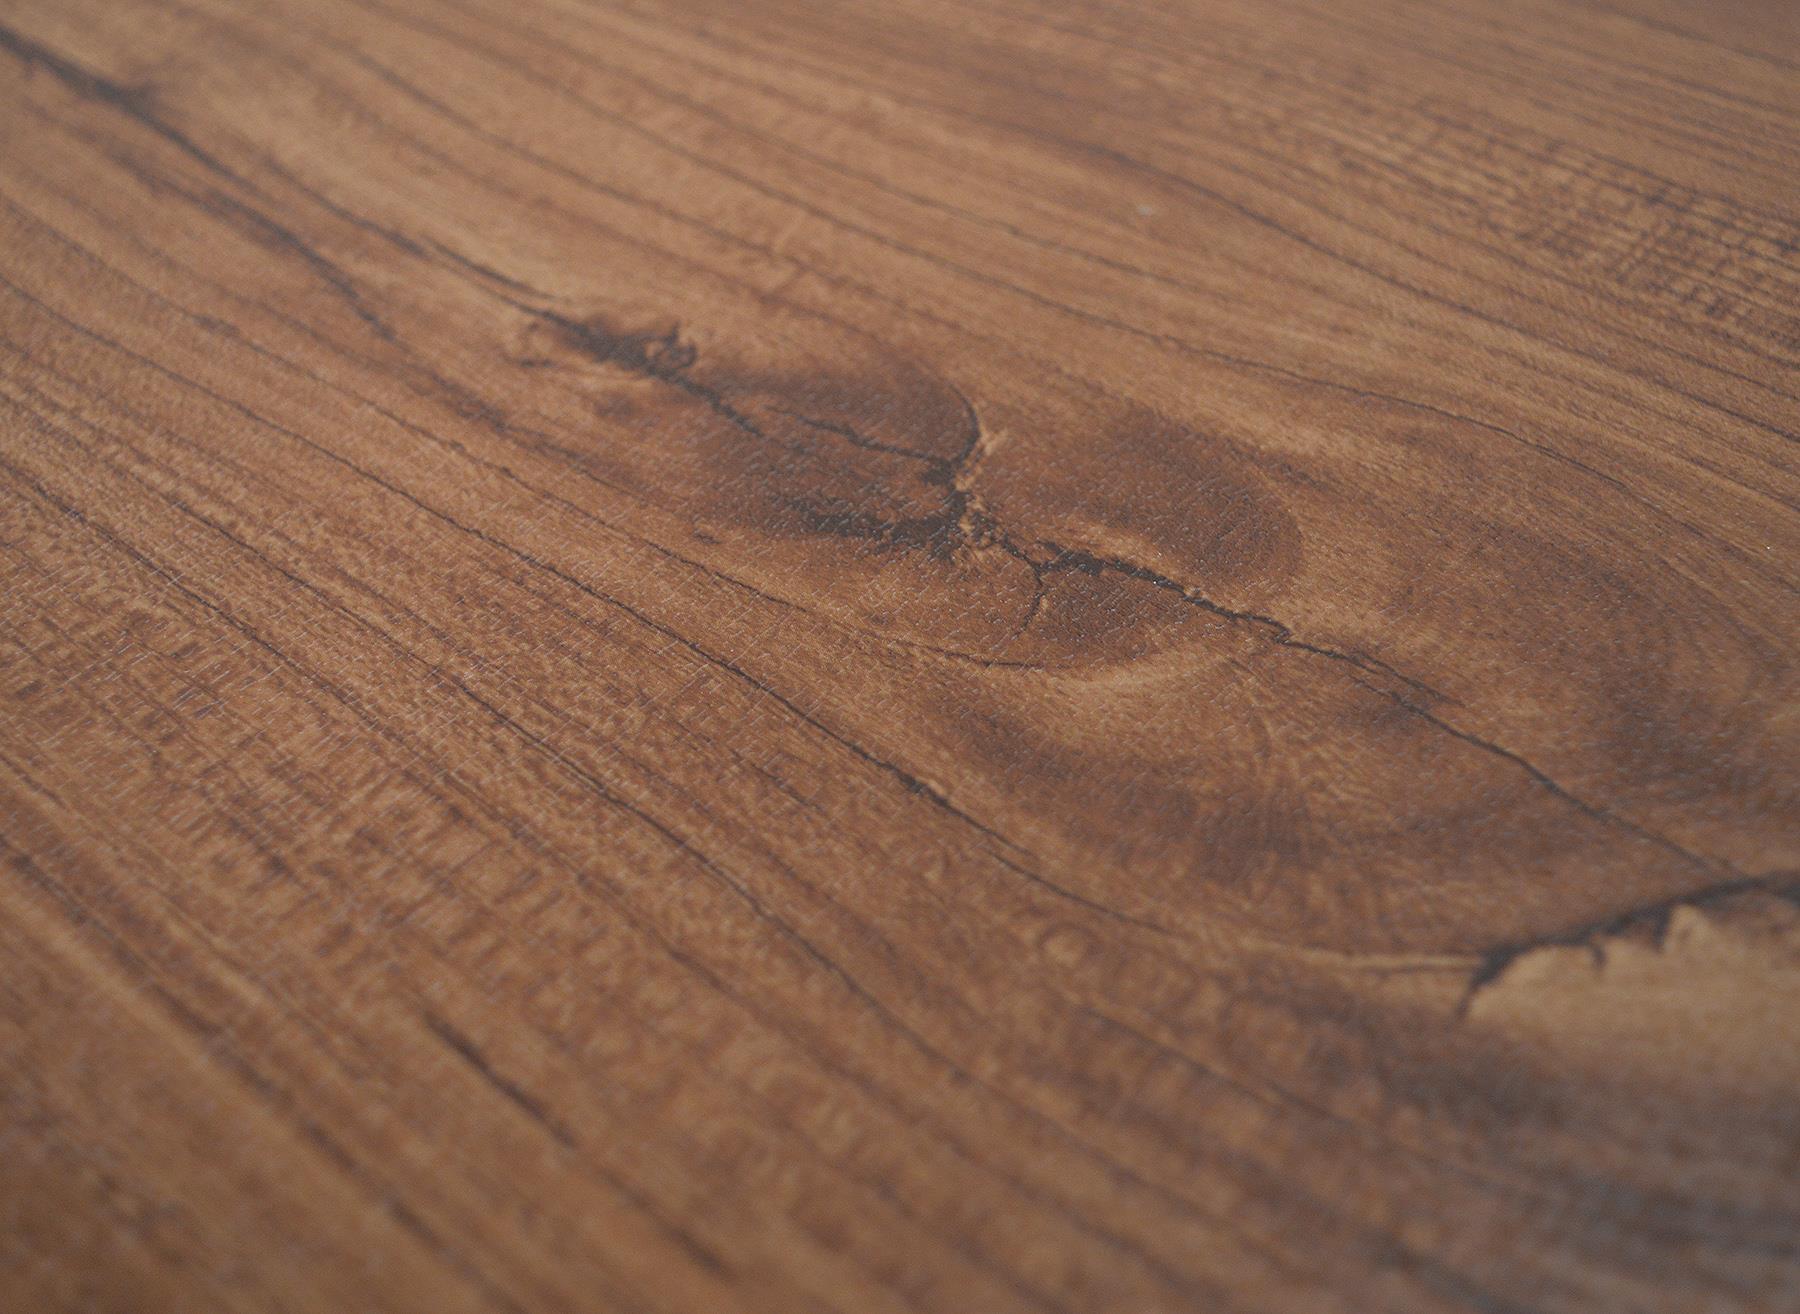 Floor-Tiles-Self-Adhesive-Vinyl-Flooring-Kitchen-Bathroom-Brown-Wood-Grain thumbnail 31